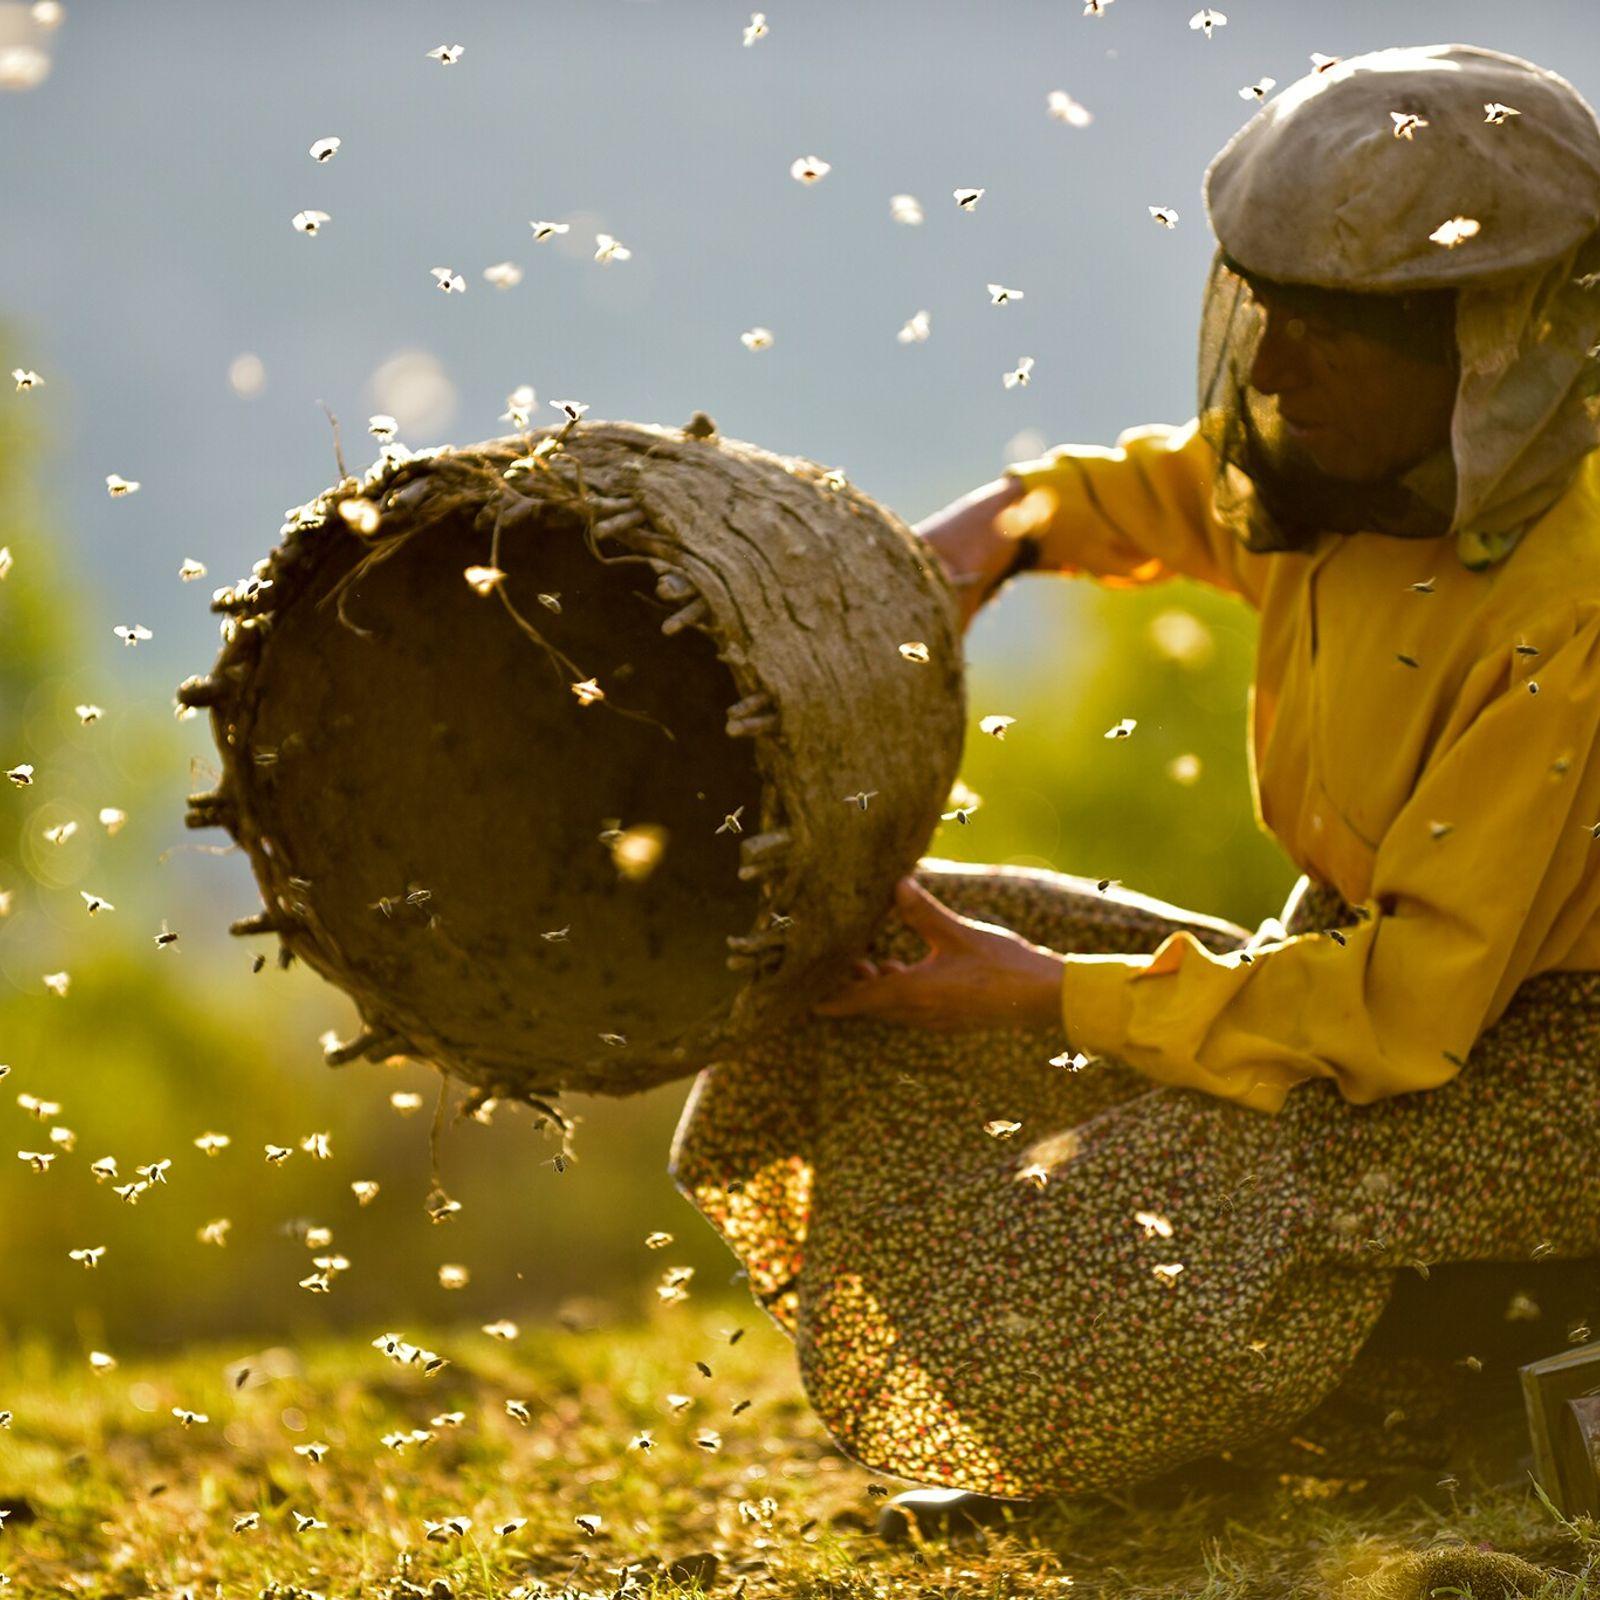 Honeyland, directed by Tamara Kotevska and Ljubomir Stefanov (2019), paints a portrait of North Macedonian beekeepers and ...